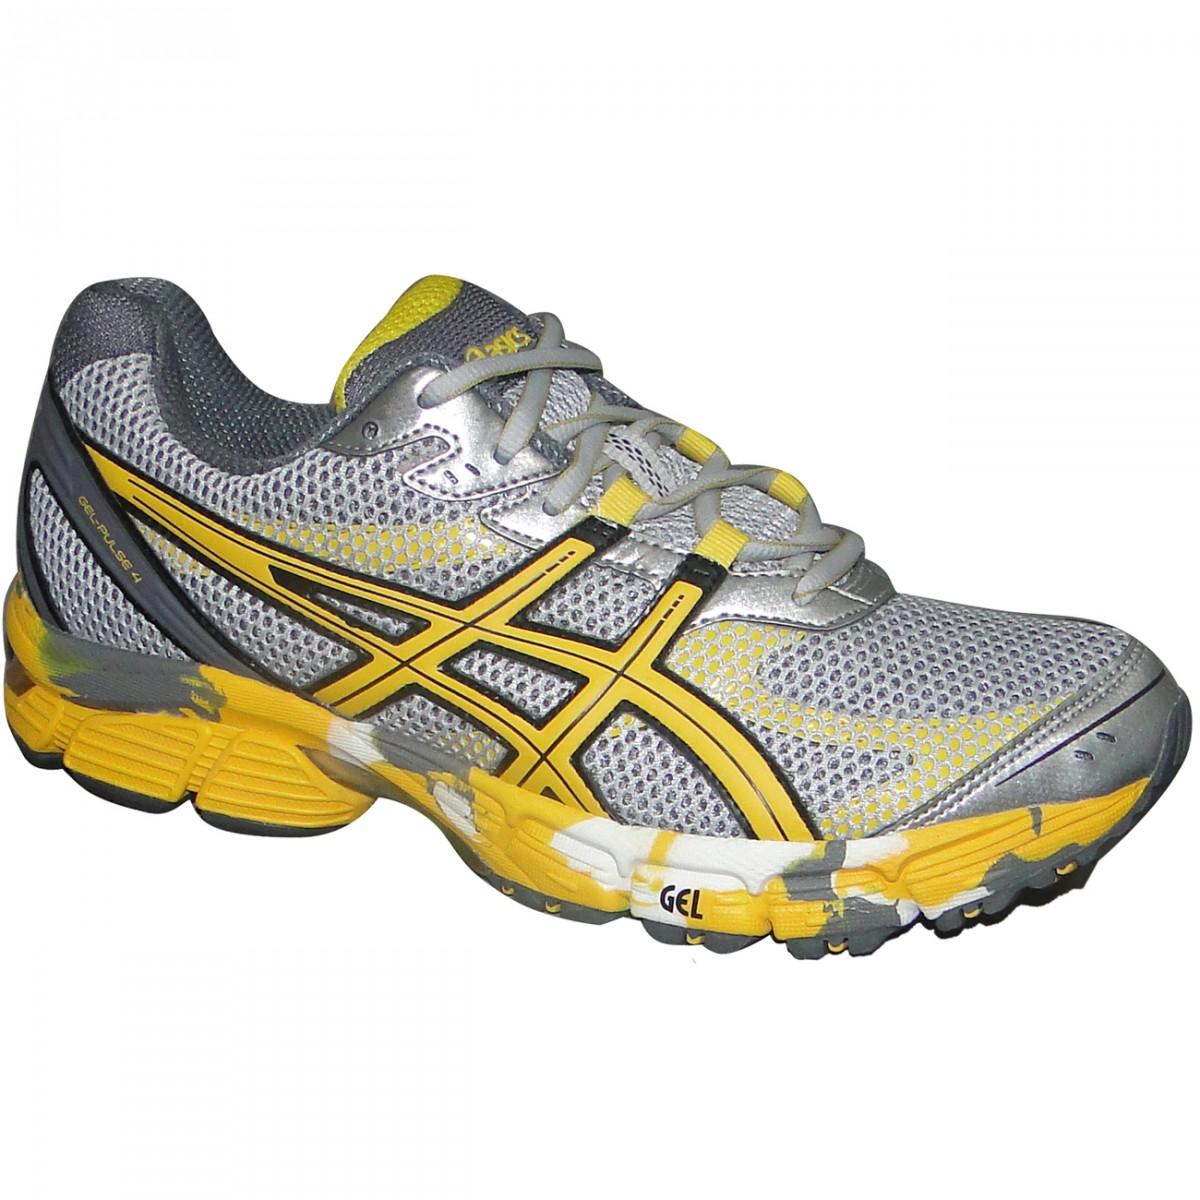 0b2f34b51ce Tenis Asics Gel-Pulse 4 T240Q-9304 - Cinza Amarelo - Chuteira Nike ...